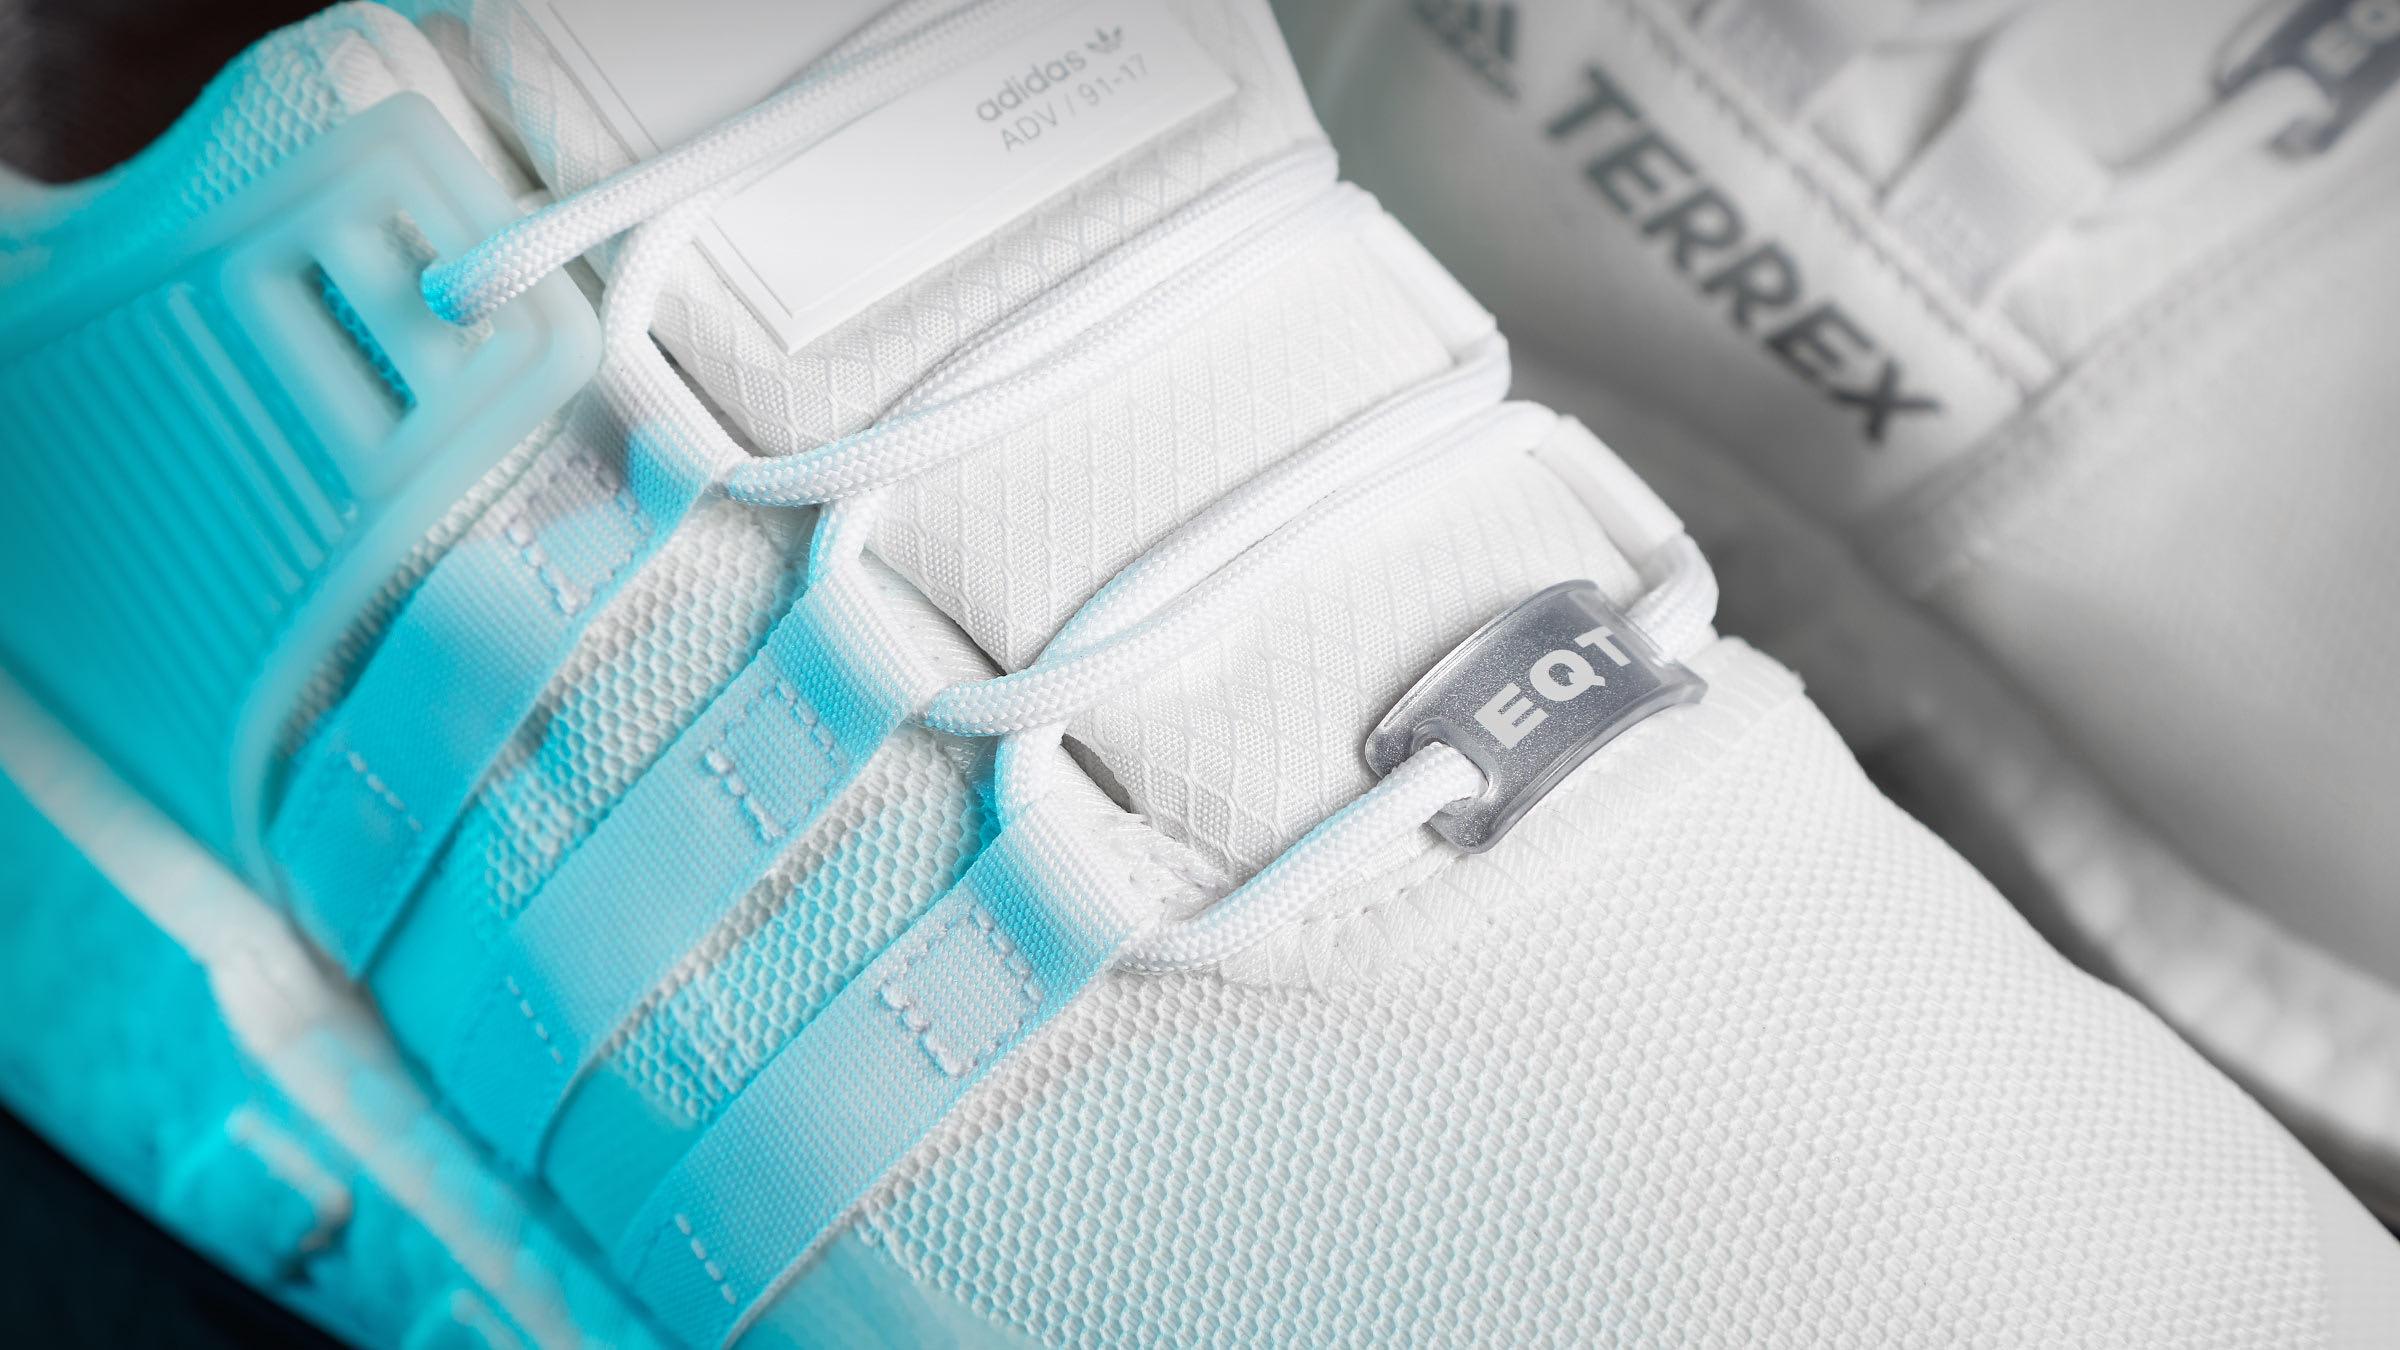 adidas eqt waterproof